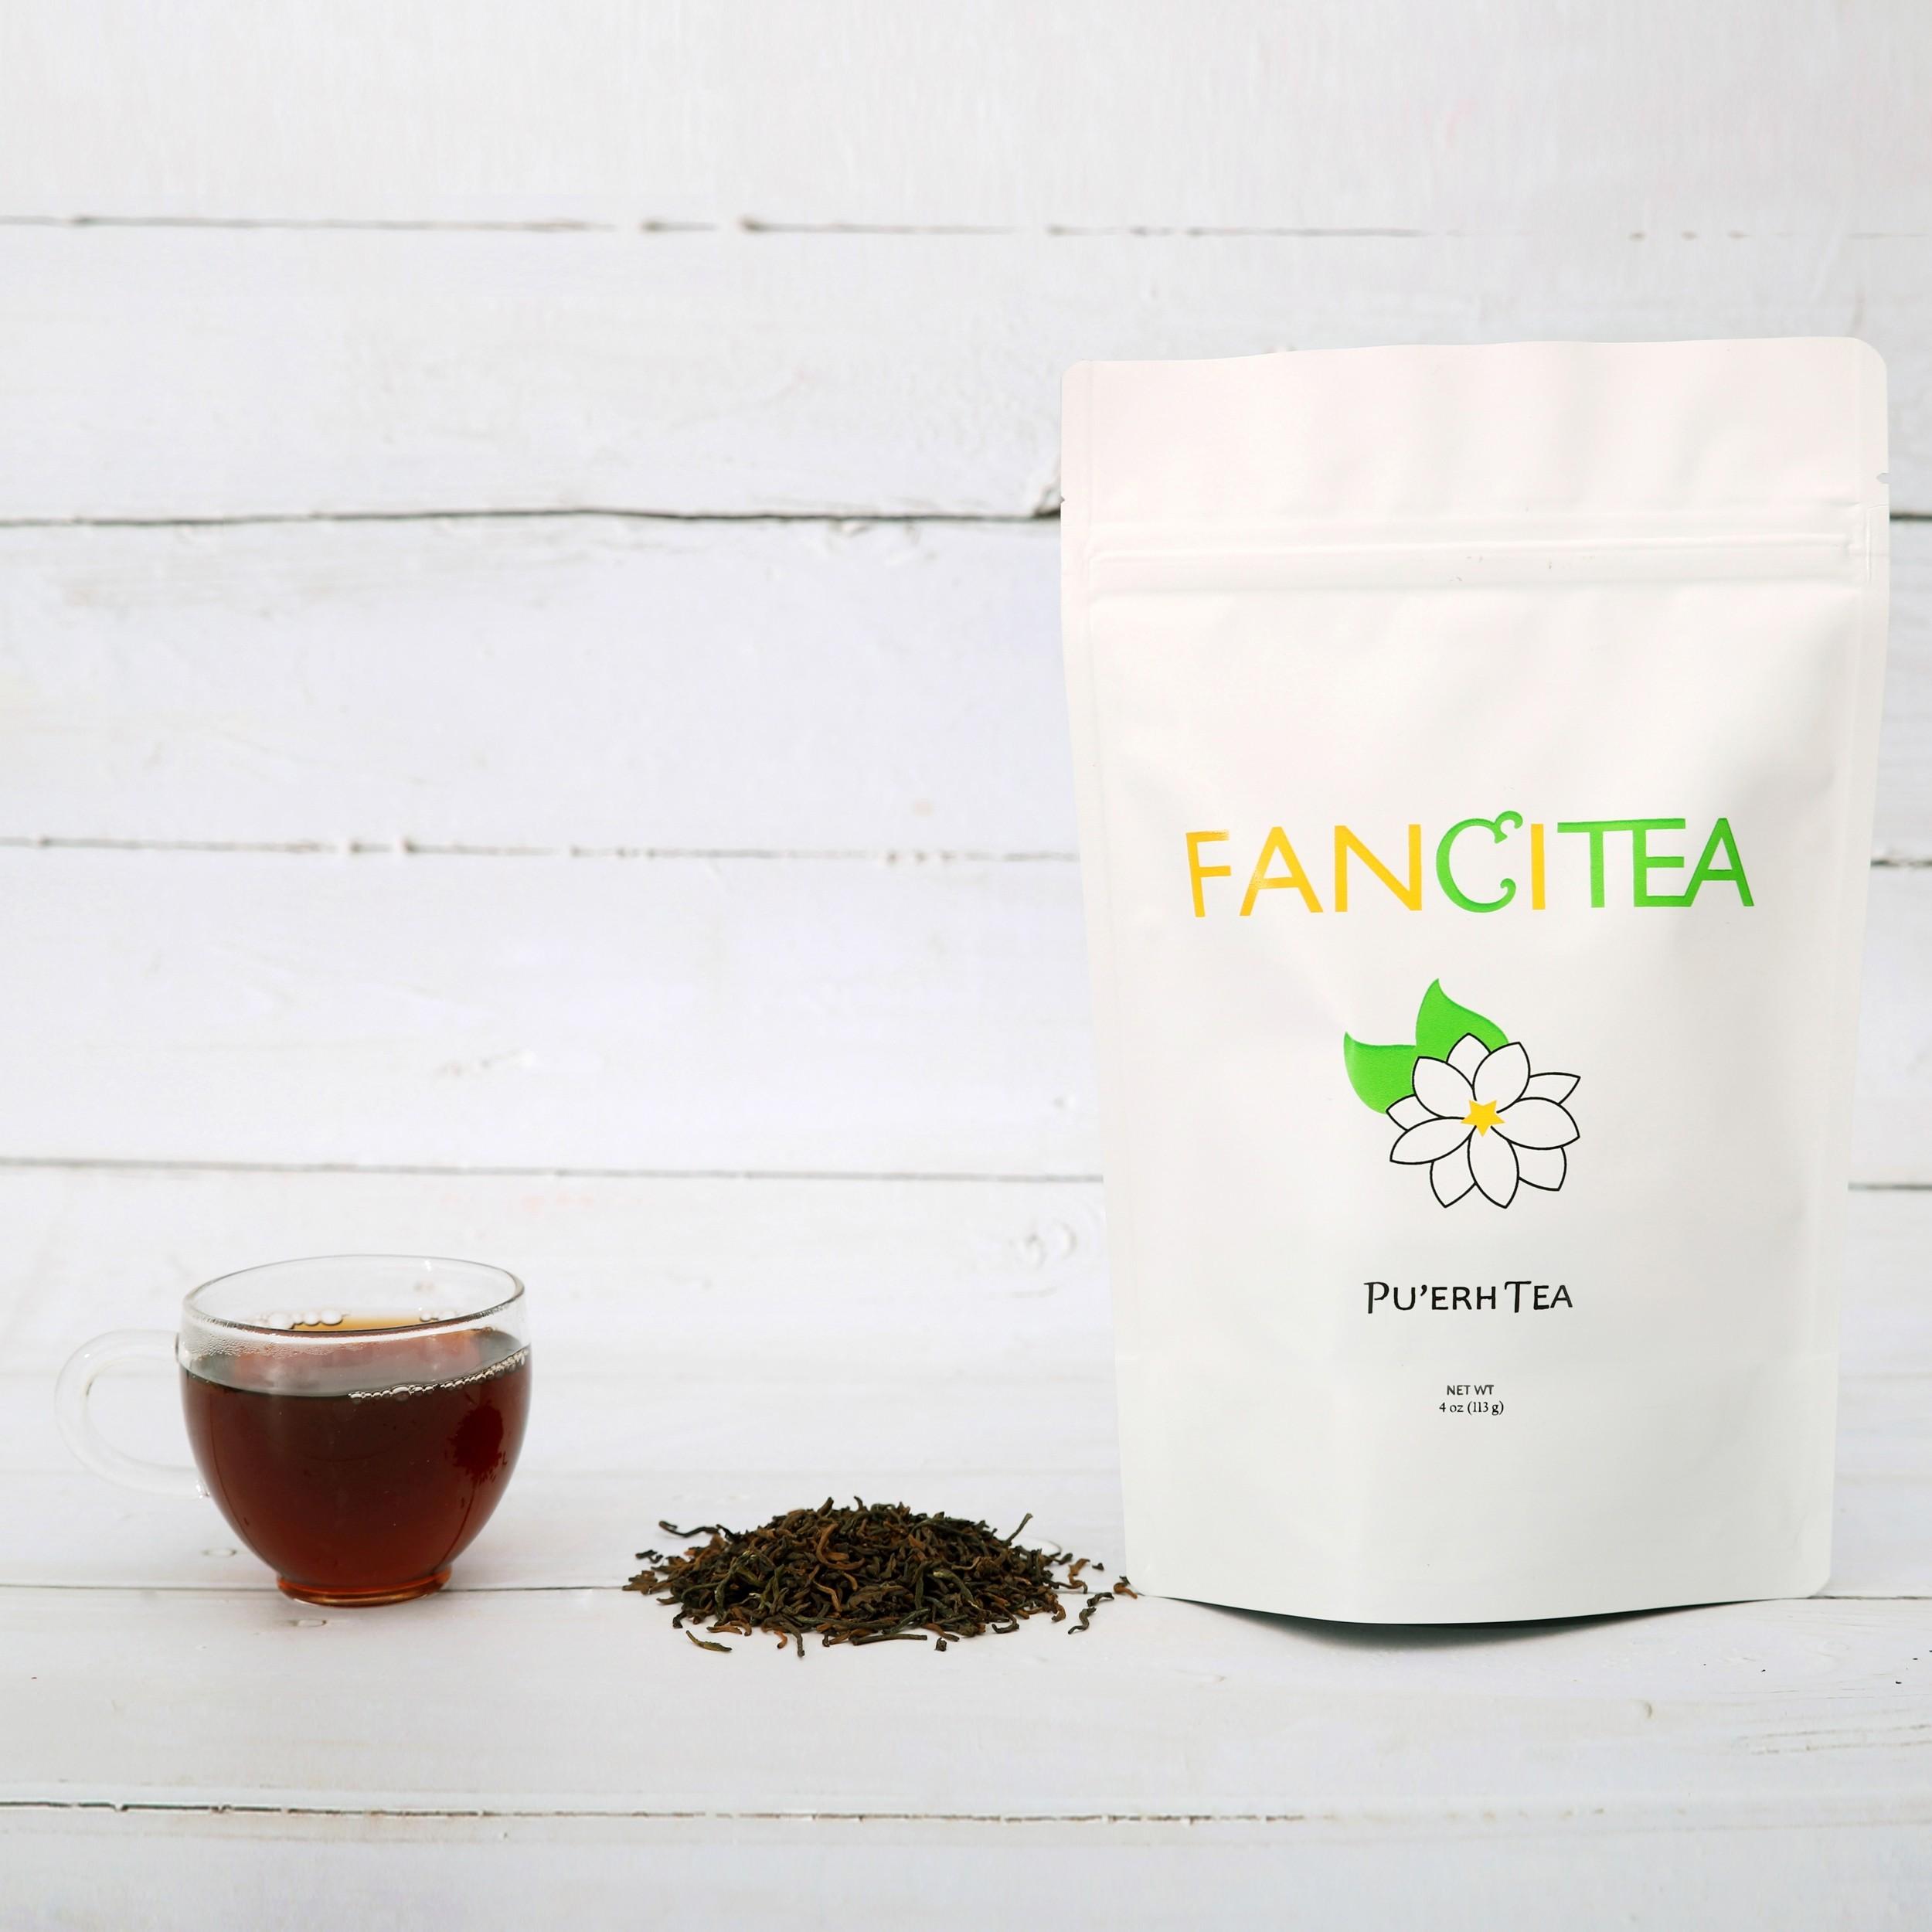 Fancitea High Quality Famous Chinese Pu'erh Loose Tea Leaves 16oz/135 servings